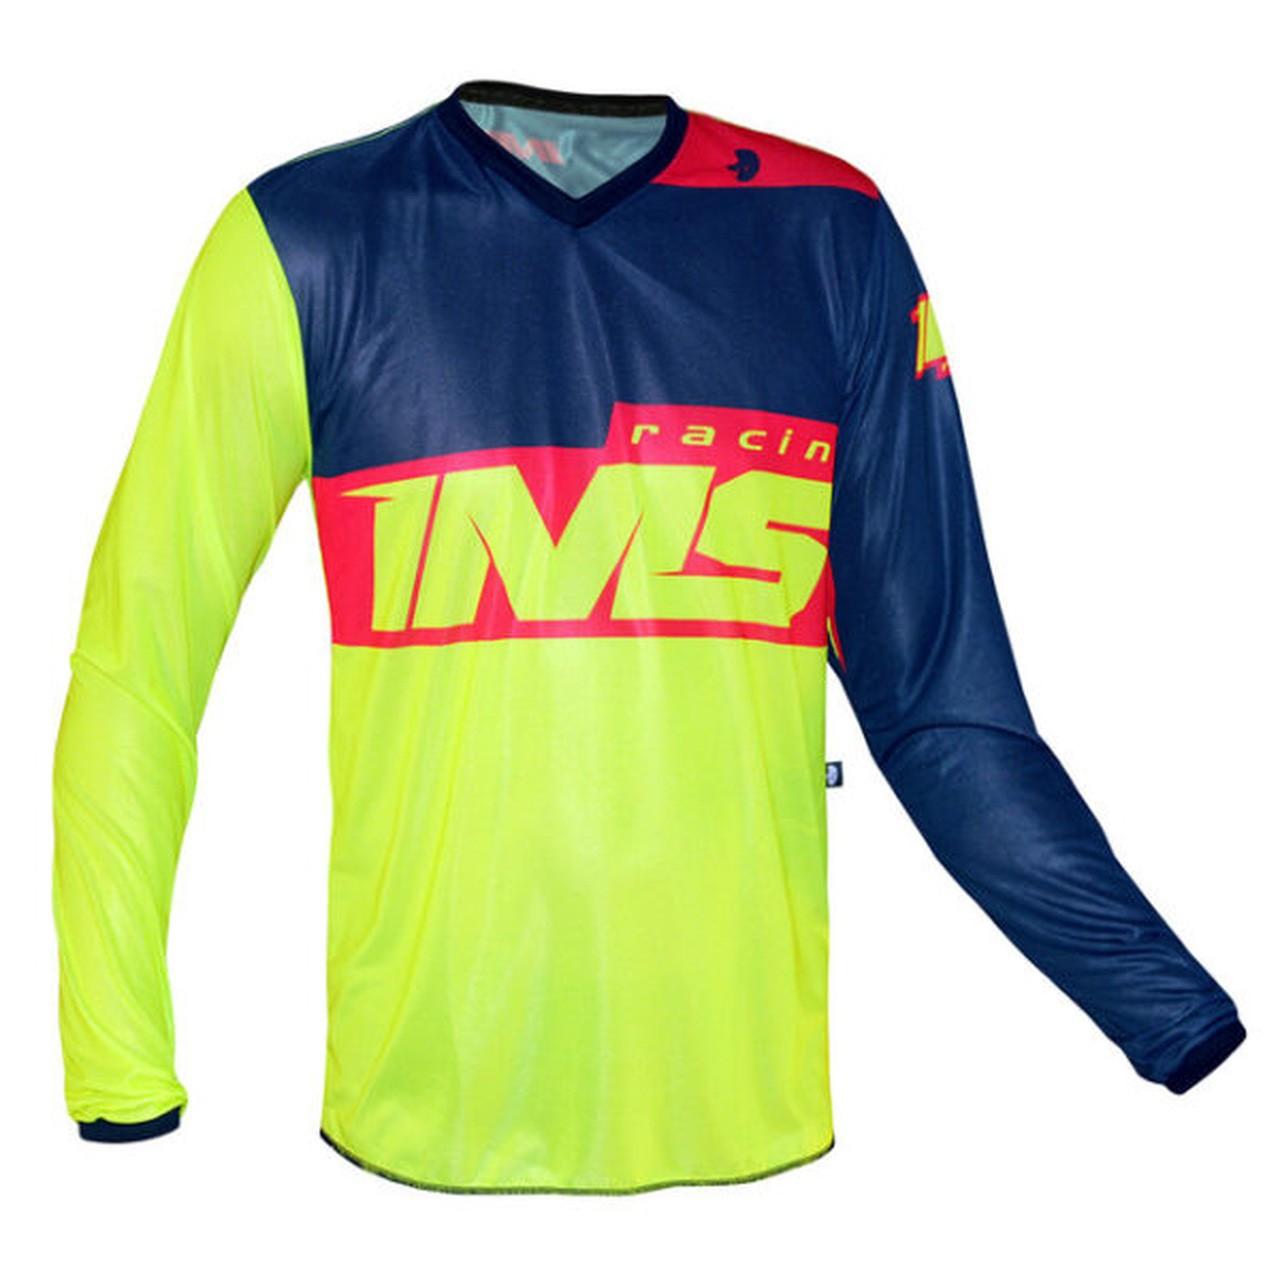 Camisa IMS Army - Fluor